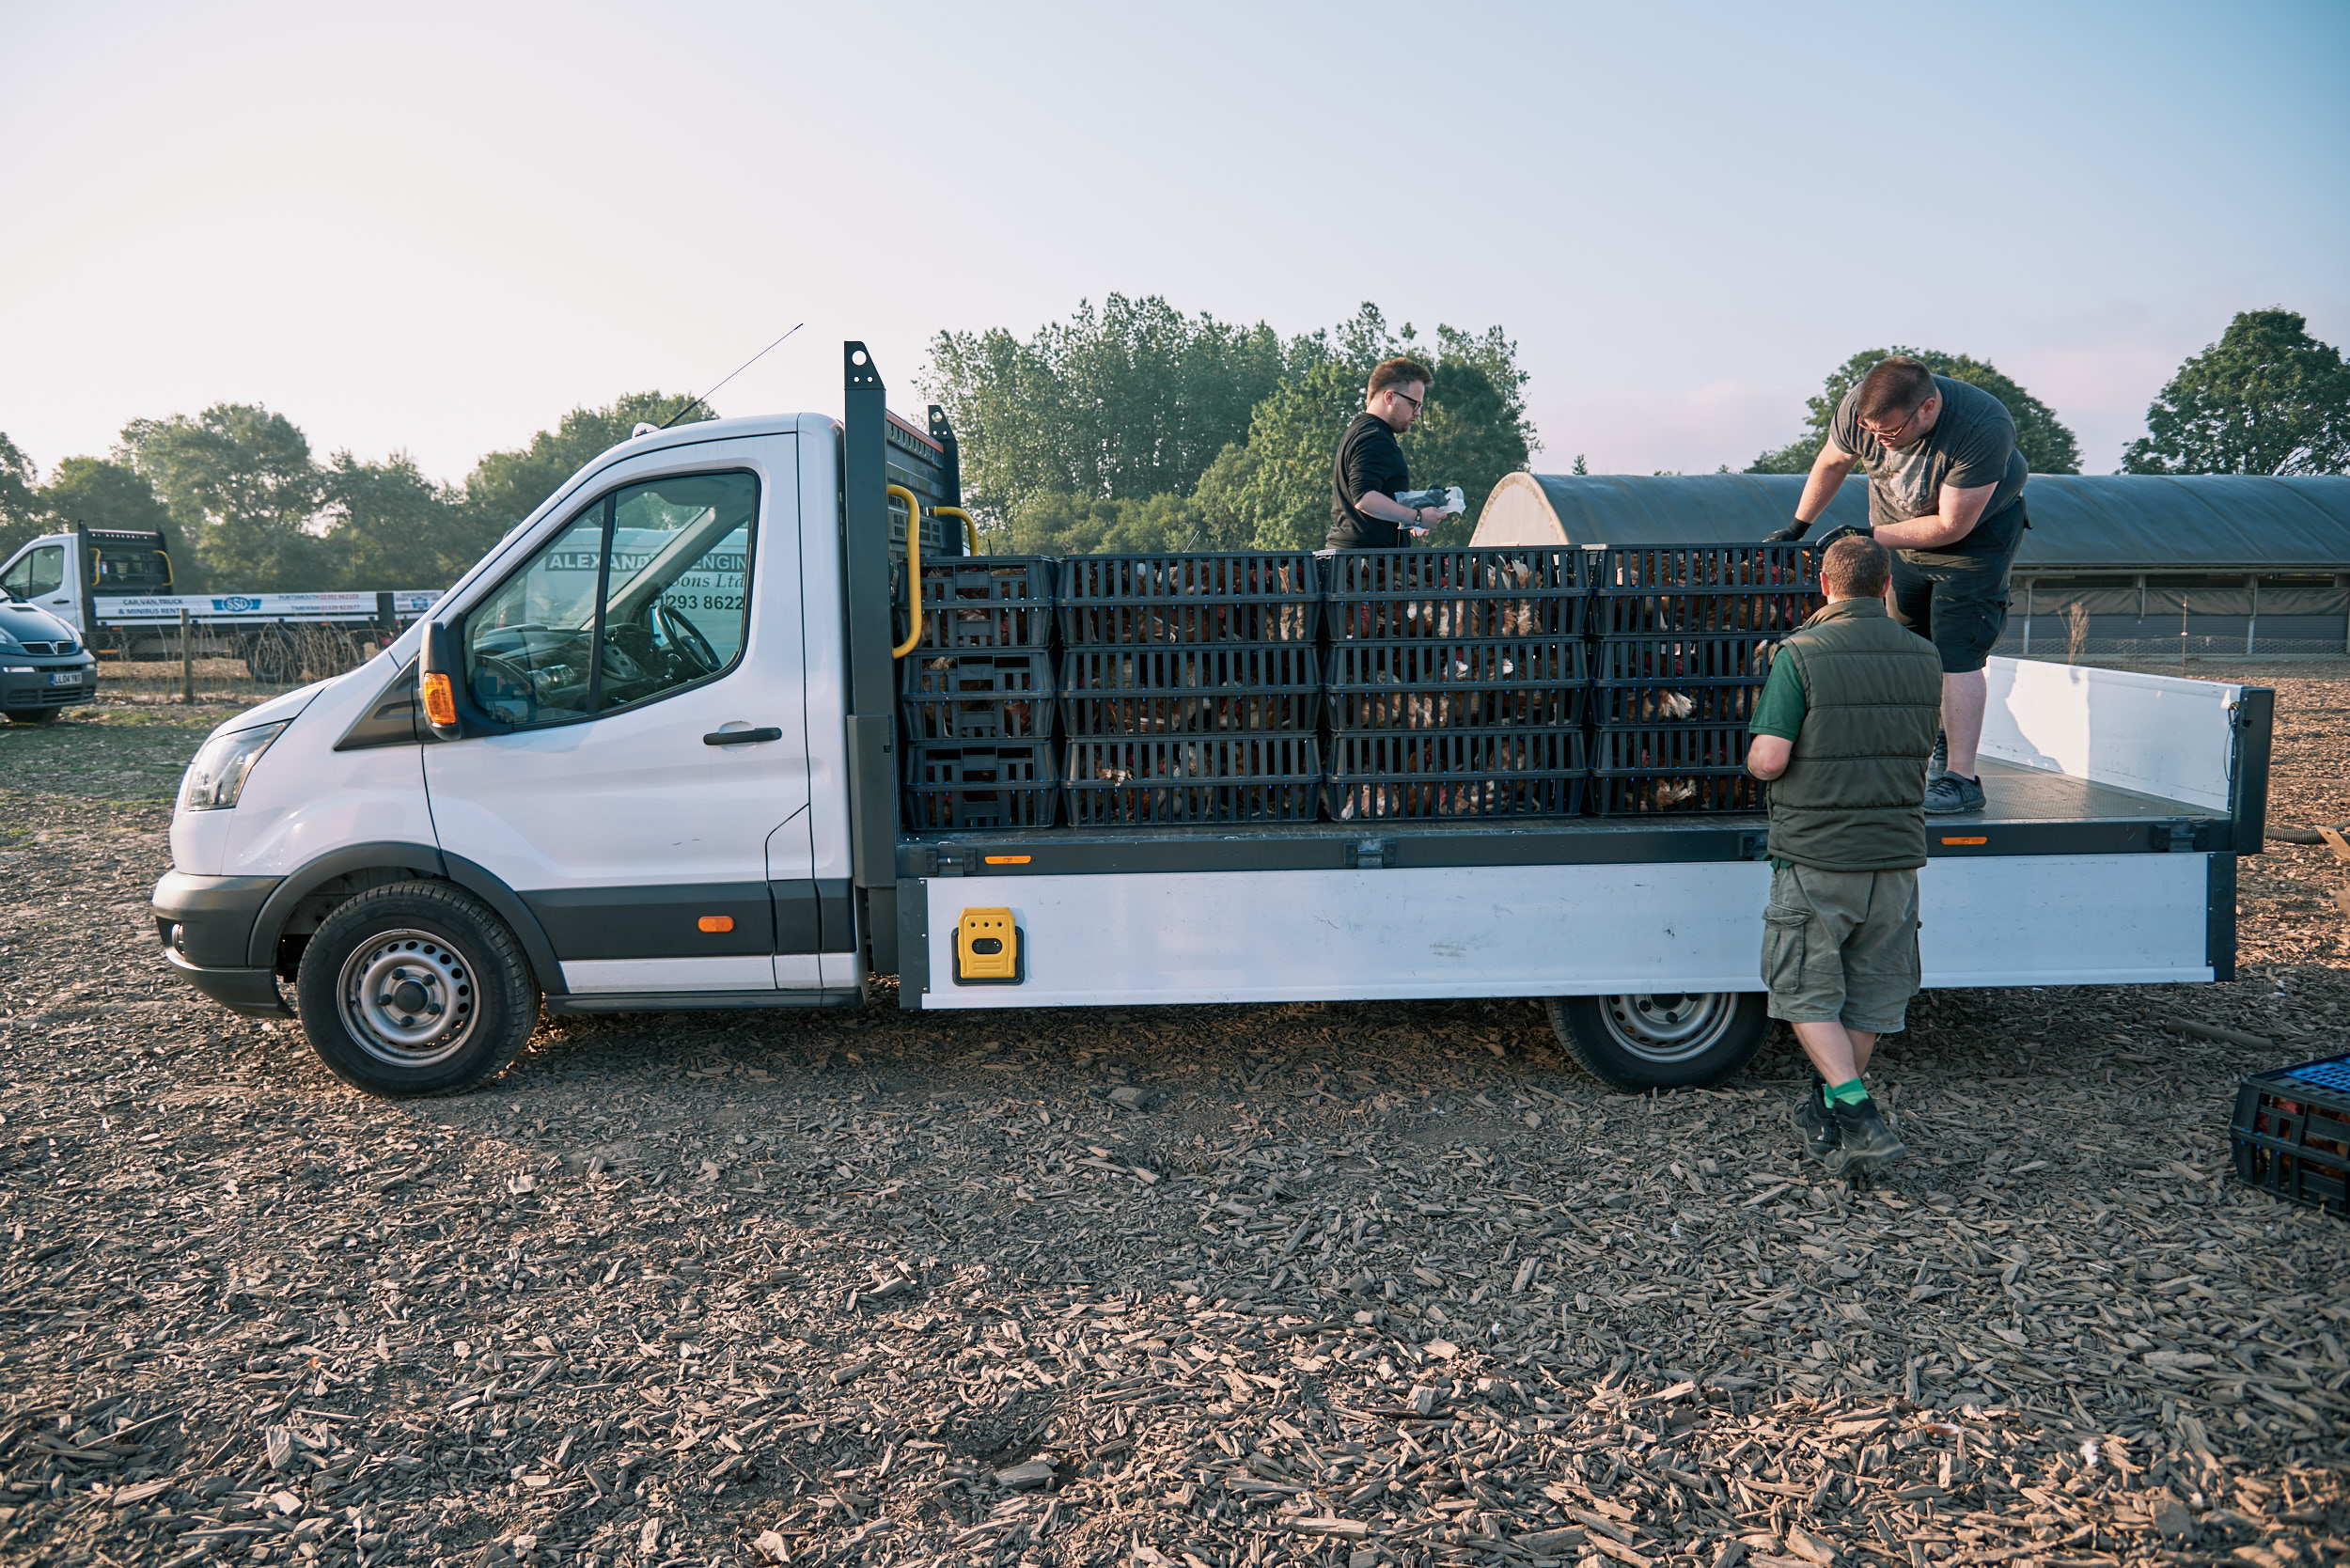 rookery-farm-organic-eggs-FSFH-rehoming27.jpg